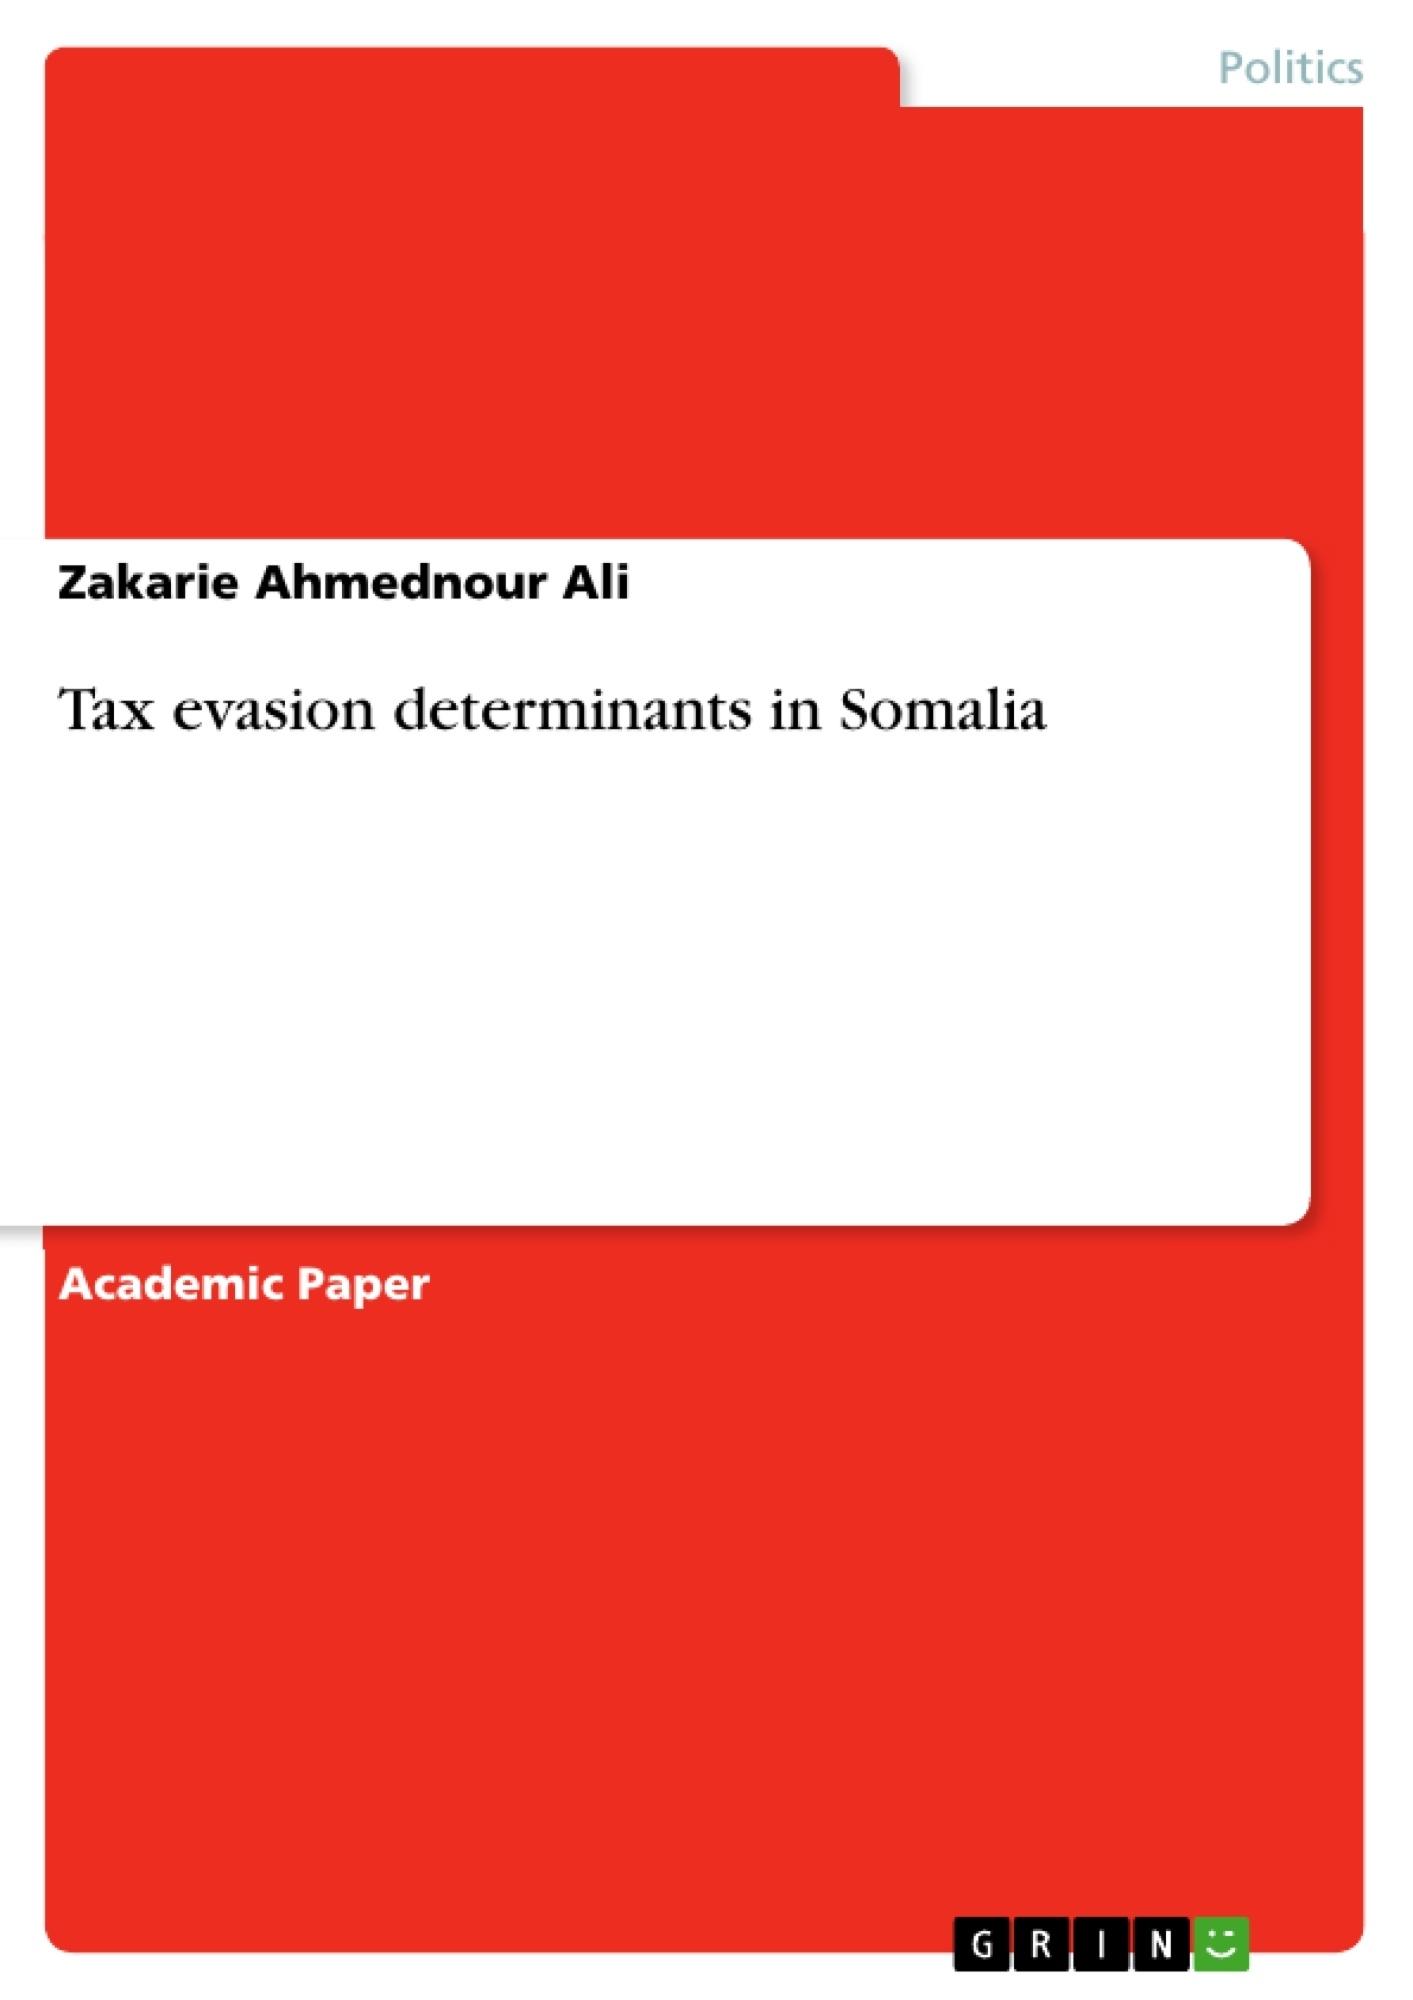 Title: Tax evasion determinants in Somalia